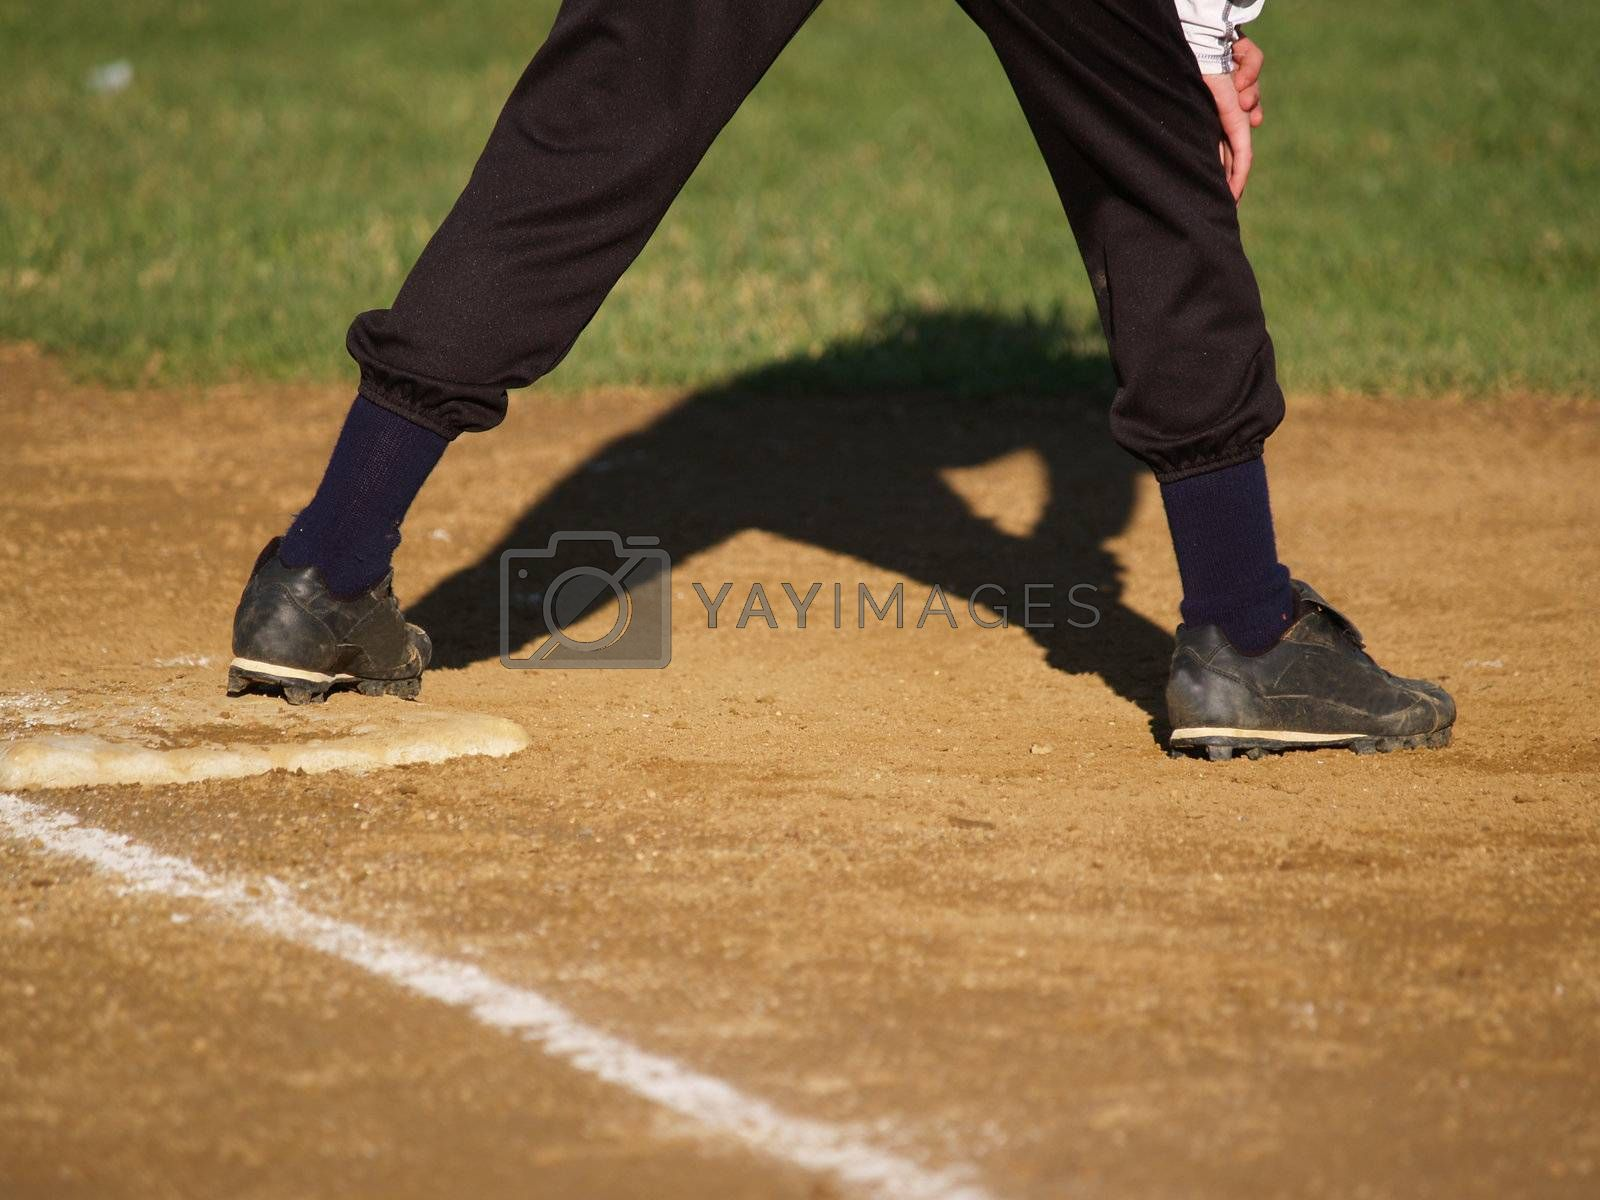 baseball player ready on the base